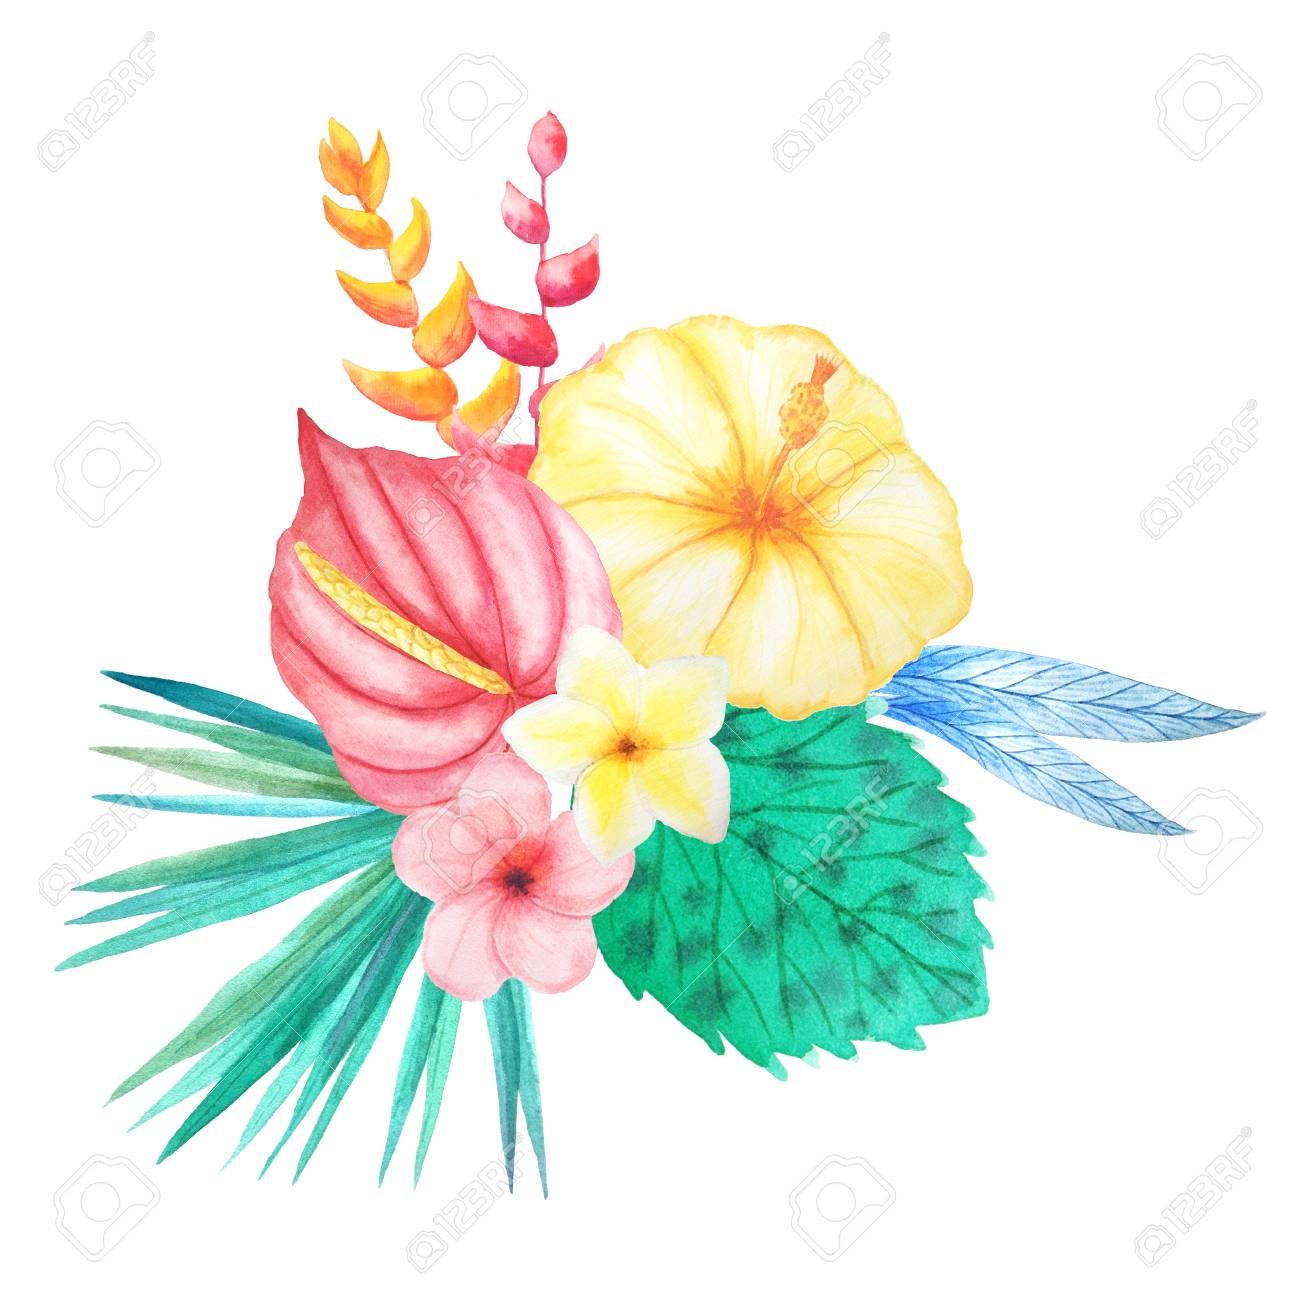 Jungle flowers free download. Luau clipart rainforest flower